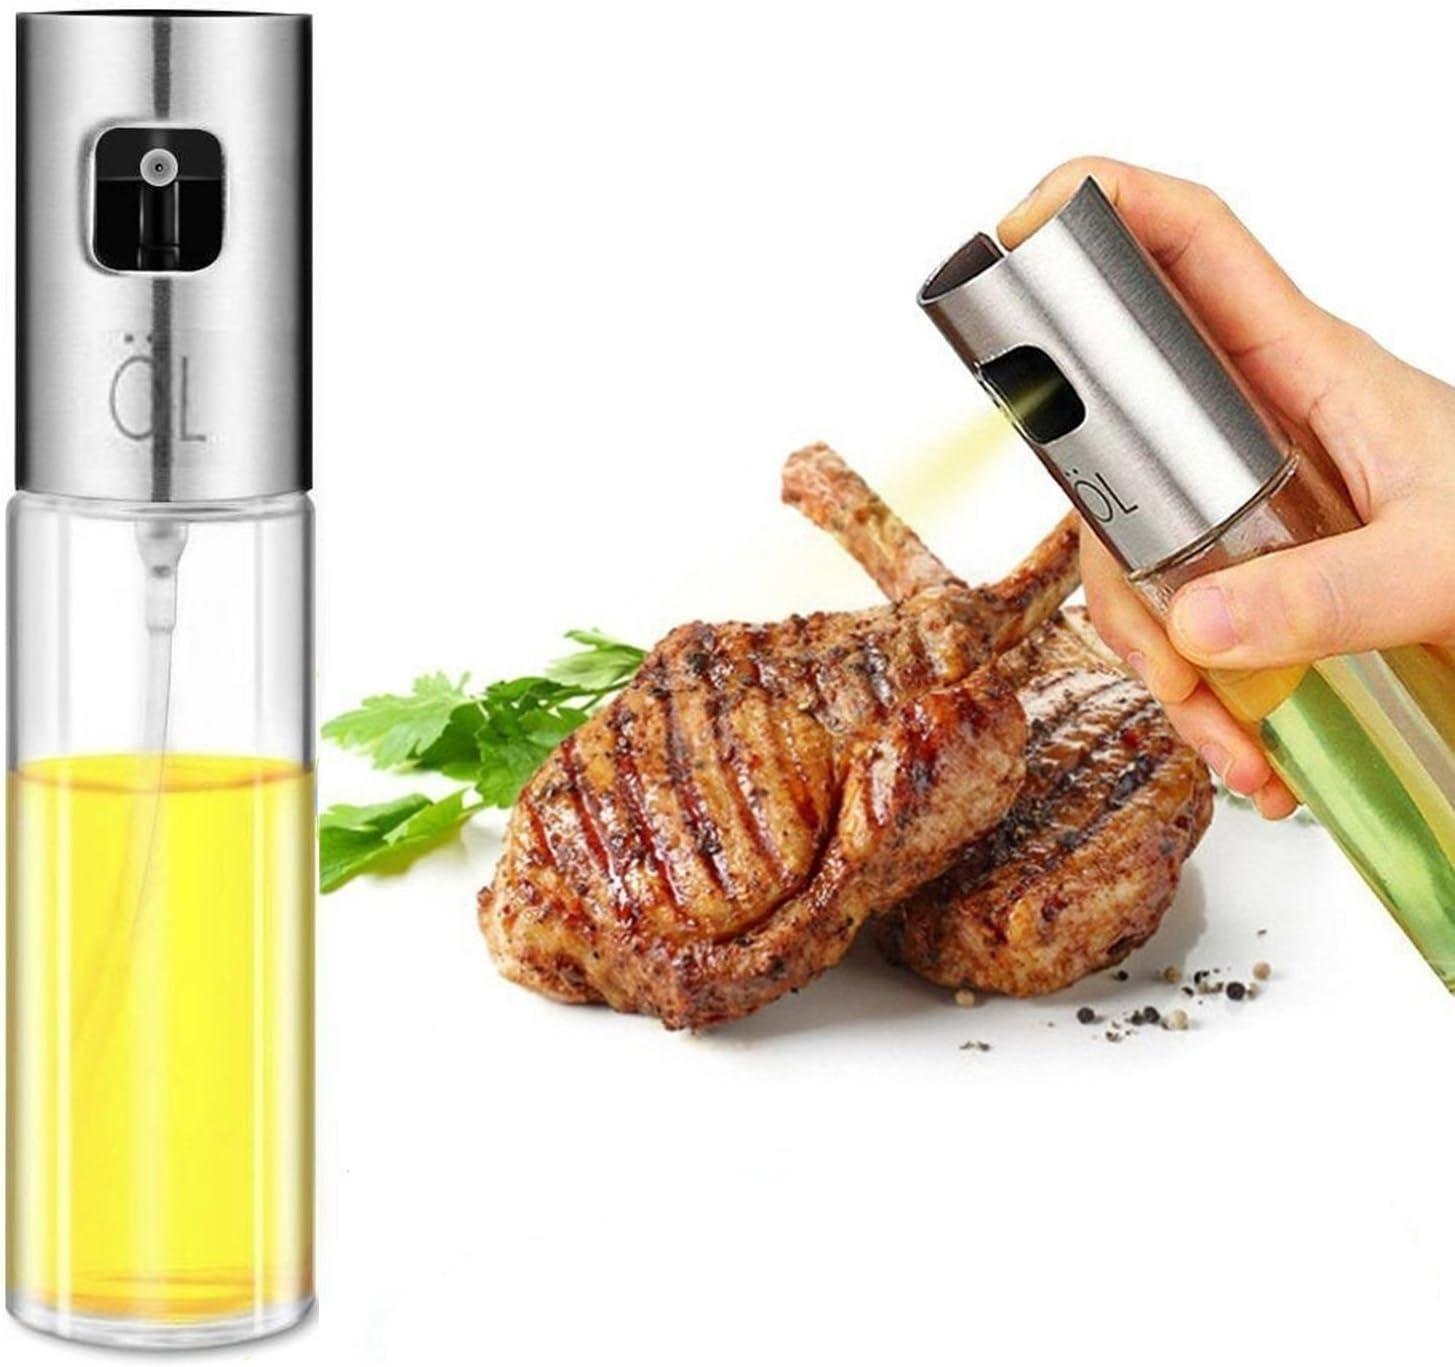 Vinegar Bottle Outdoor Portable BBQ Spray Oil Can Drum Shape Kitchen Gadget Oil Bottle for Air Fryer 200ml Stainless Steel and Glass Spray Bottle Sprayer Dispenser for Olive Oil for Cooking Baking